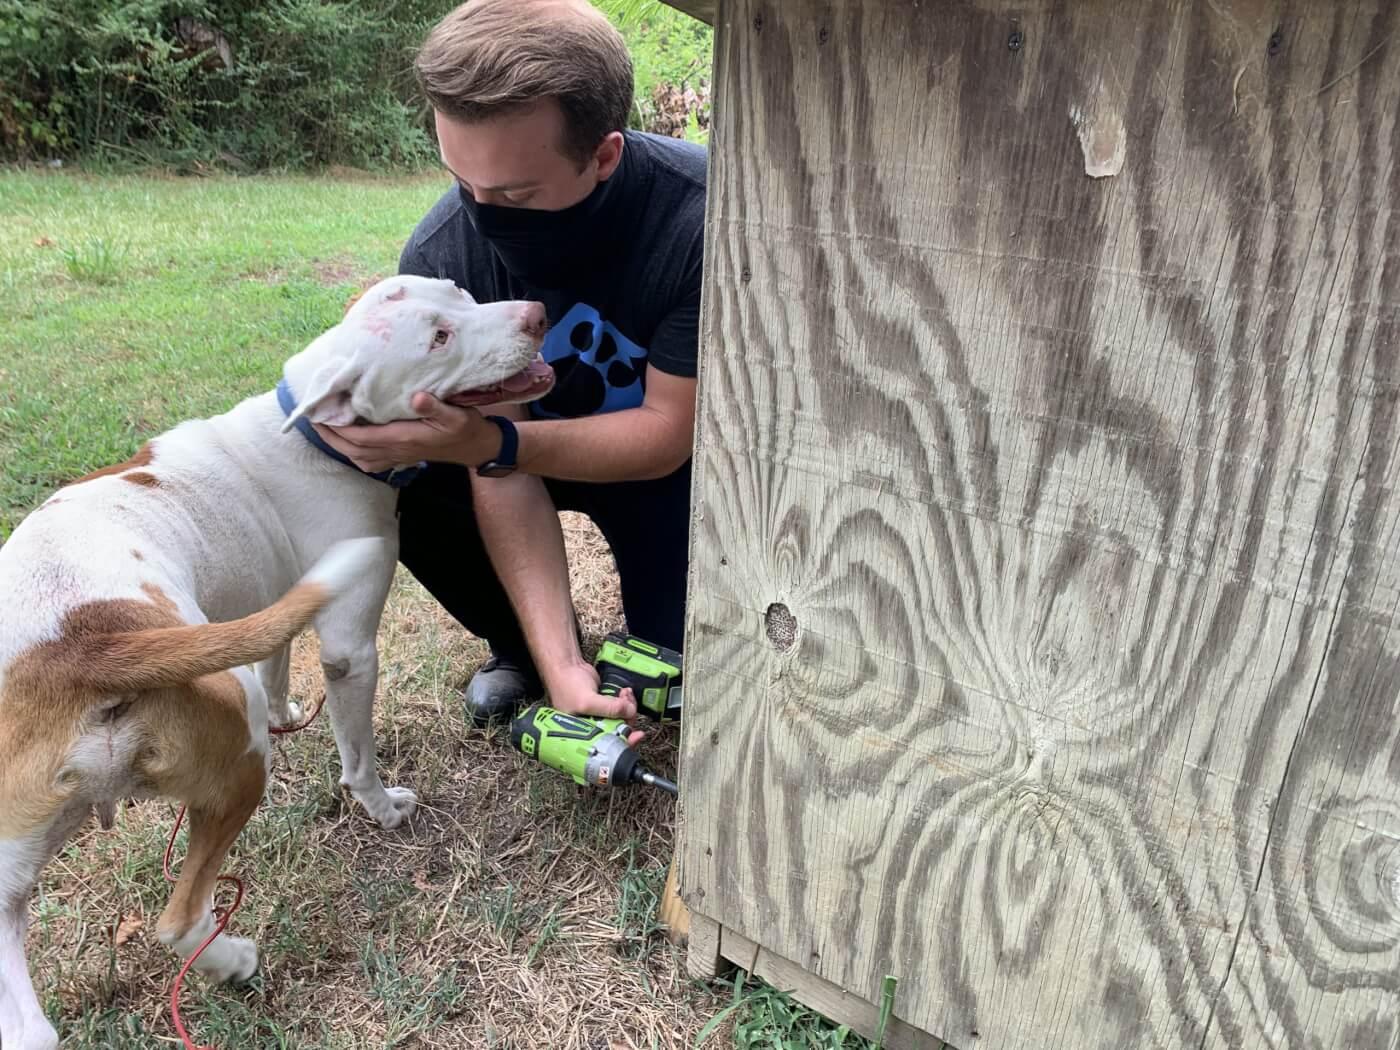 PETA fieldworkers fixes a doghouse